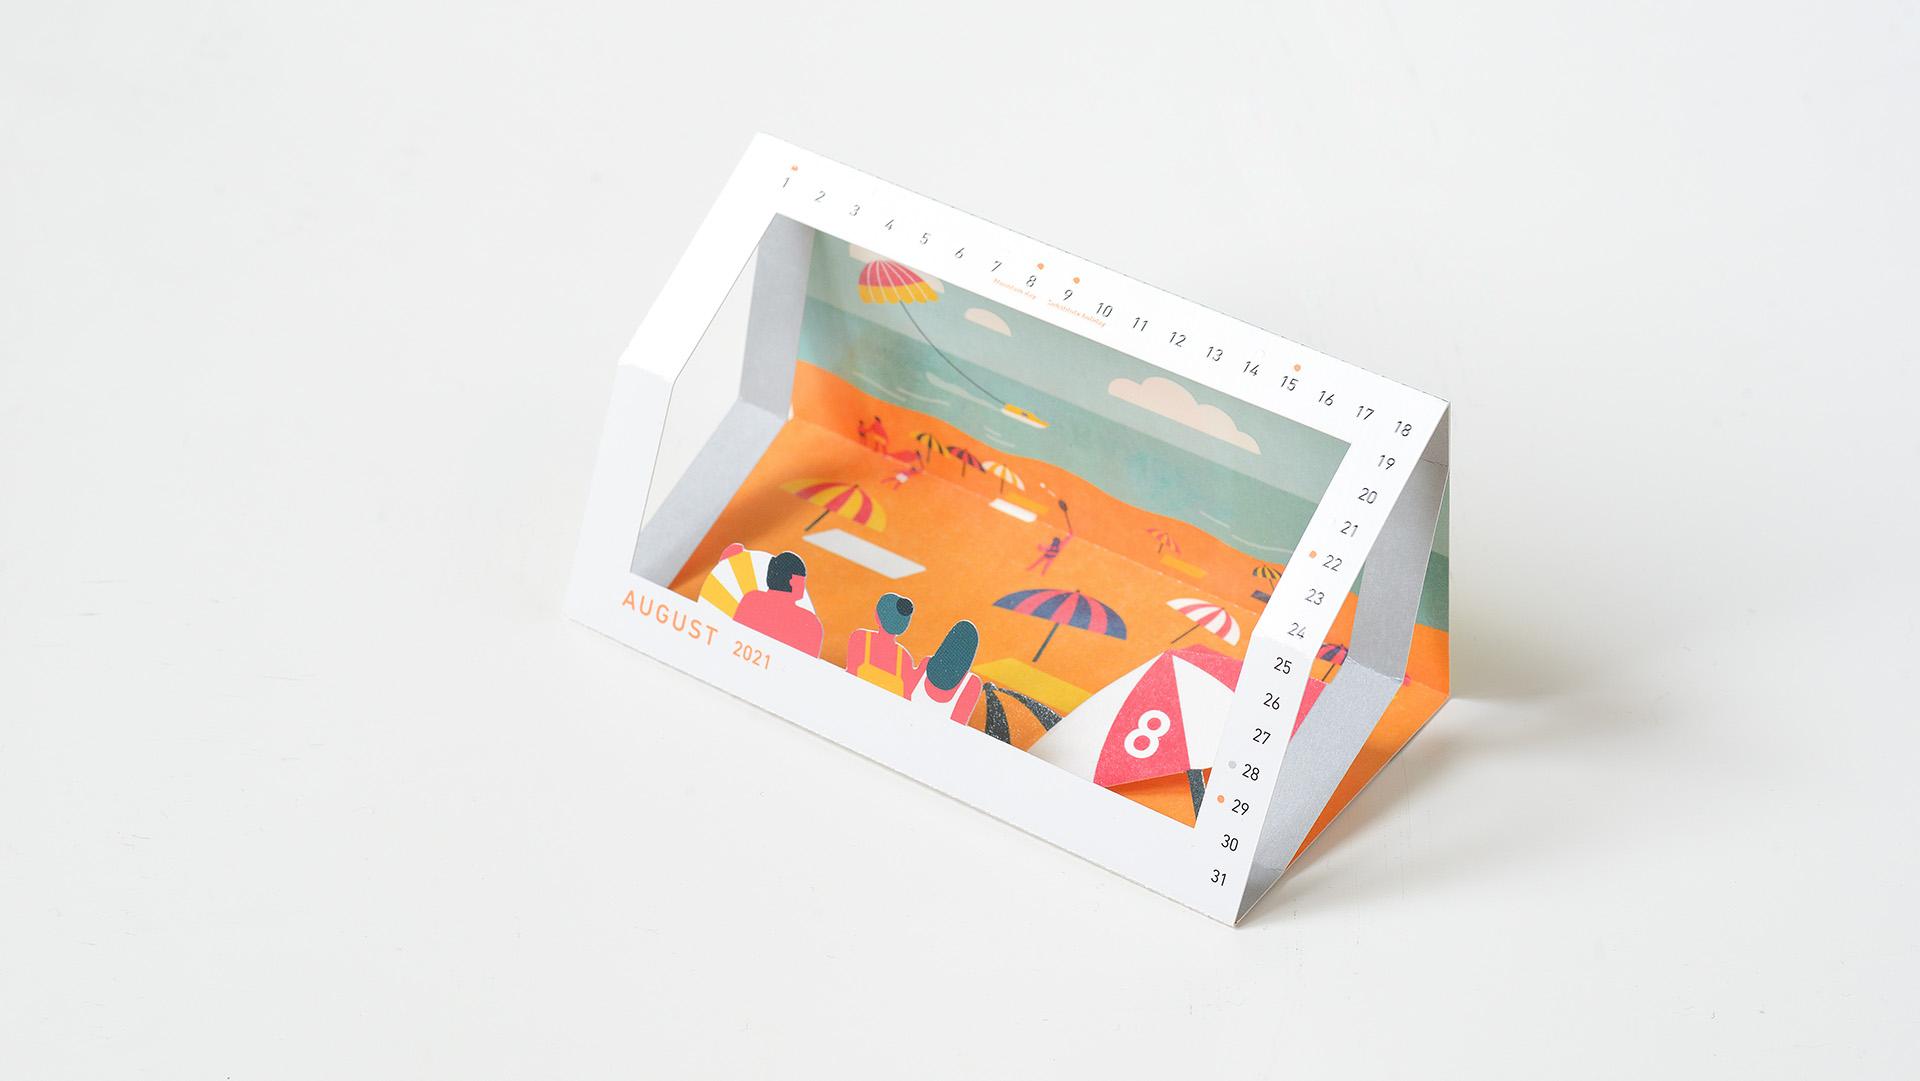 Interactive Calendar Design: 'The Next Journey' - PaperSpecs